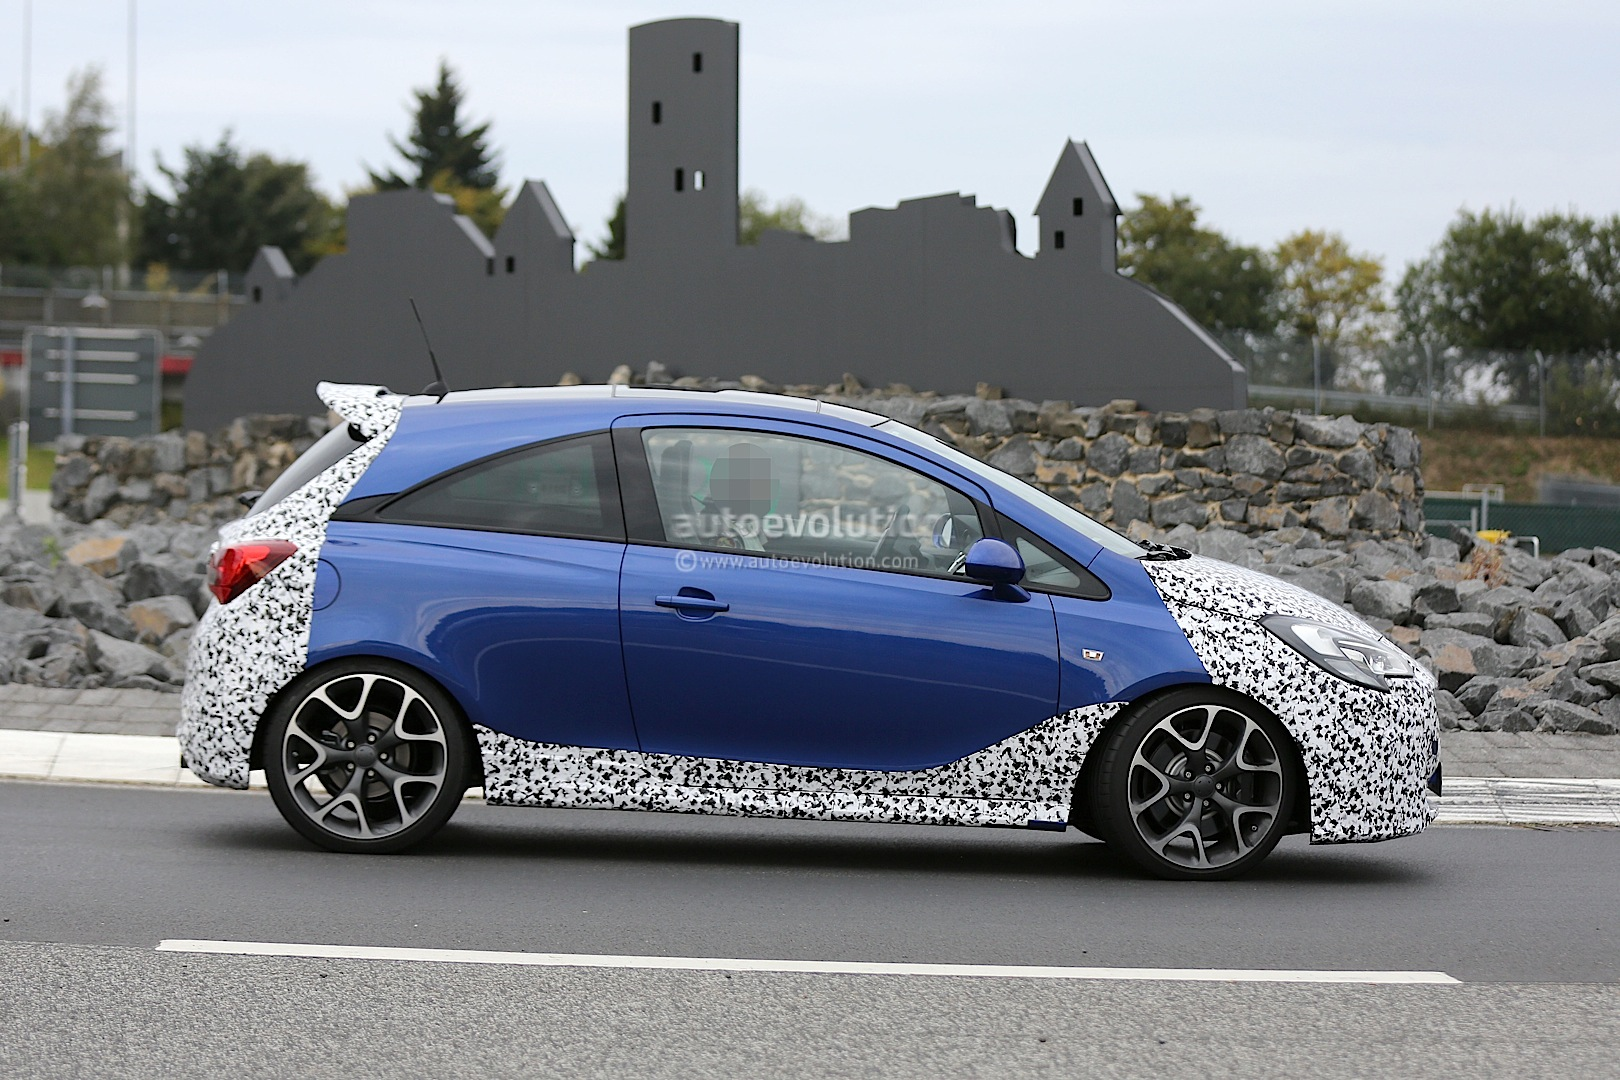 2014 - [Opel] Corsa IV [E] - Page 3 2015-opel-corsa-opc-spied-testing-photo-gallery_5